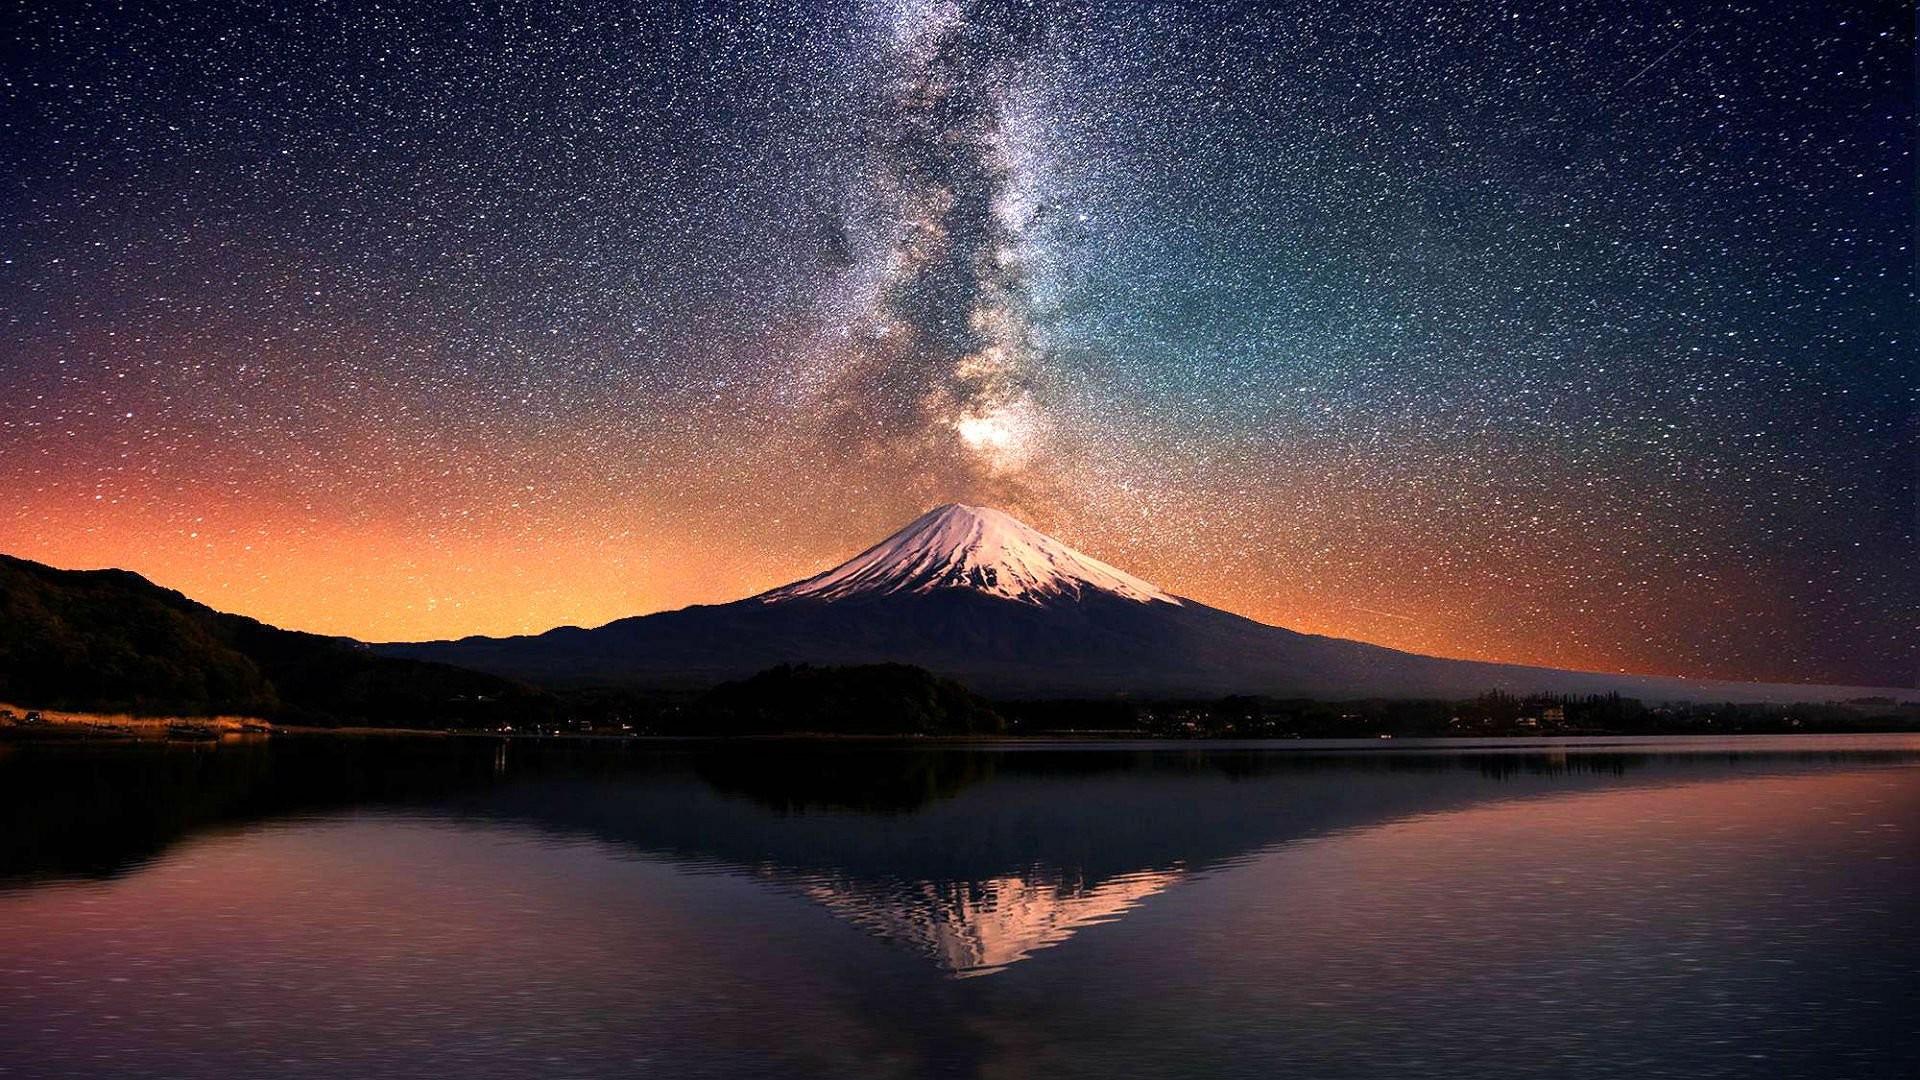 Volcano mountain lake sky stars reflection lava nature landscape mountains  fire wallpaper     652680   WallpaperUP